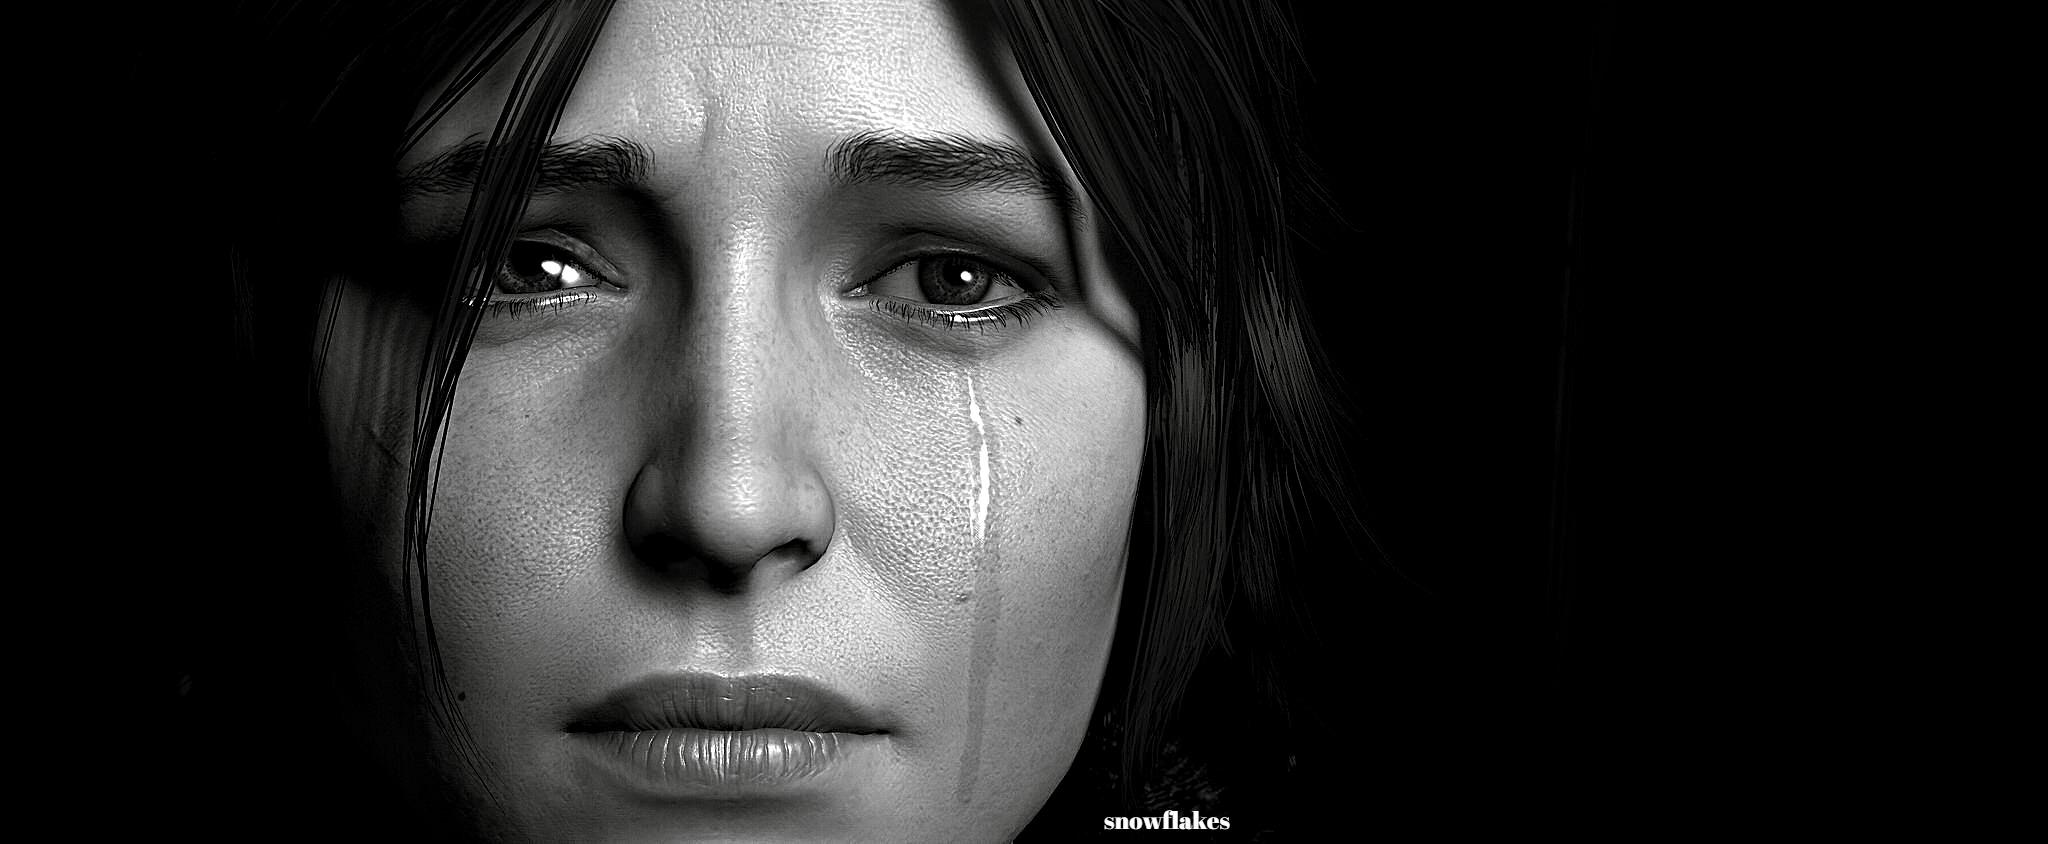 527gfr17f1 (2).jpg - Rise of the Tomb Raider